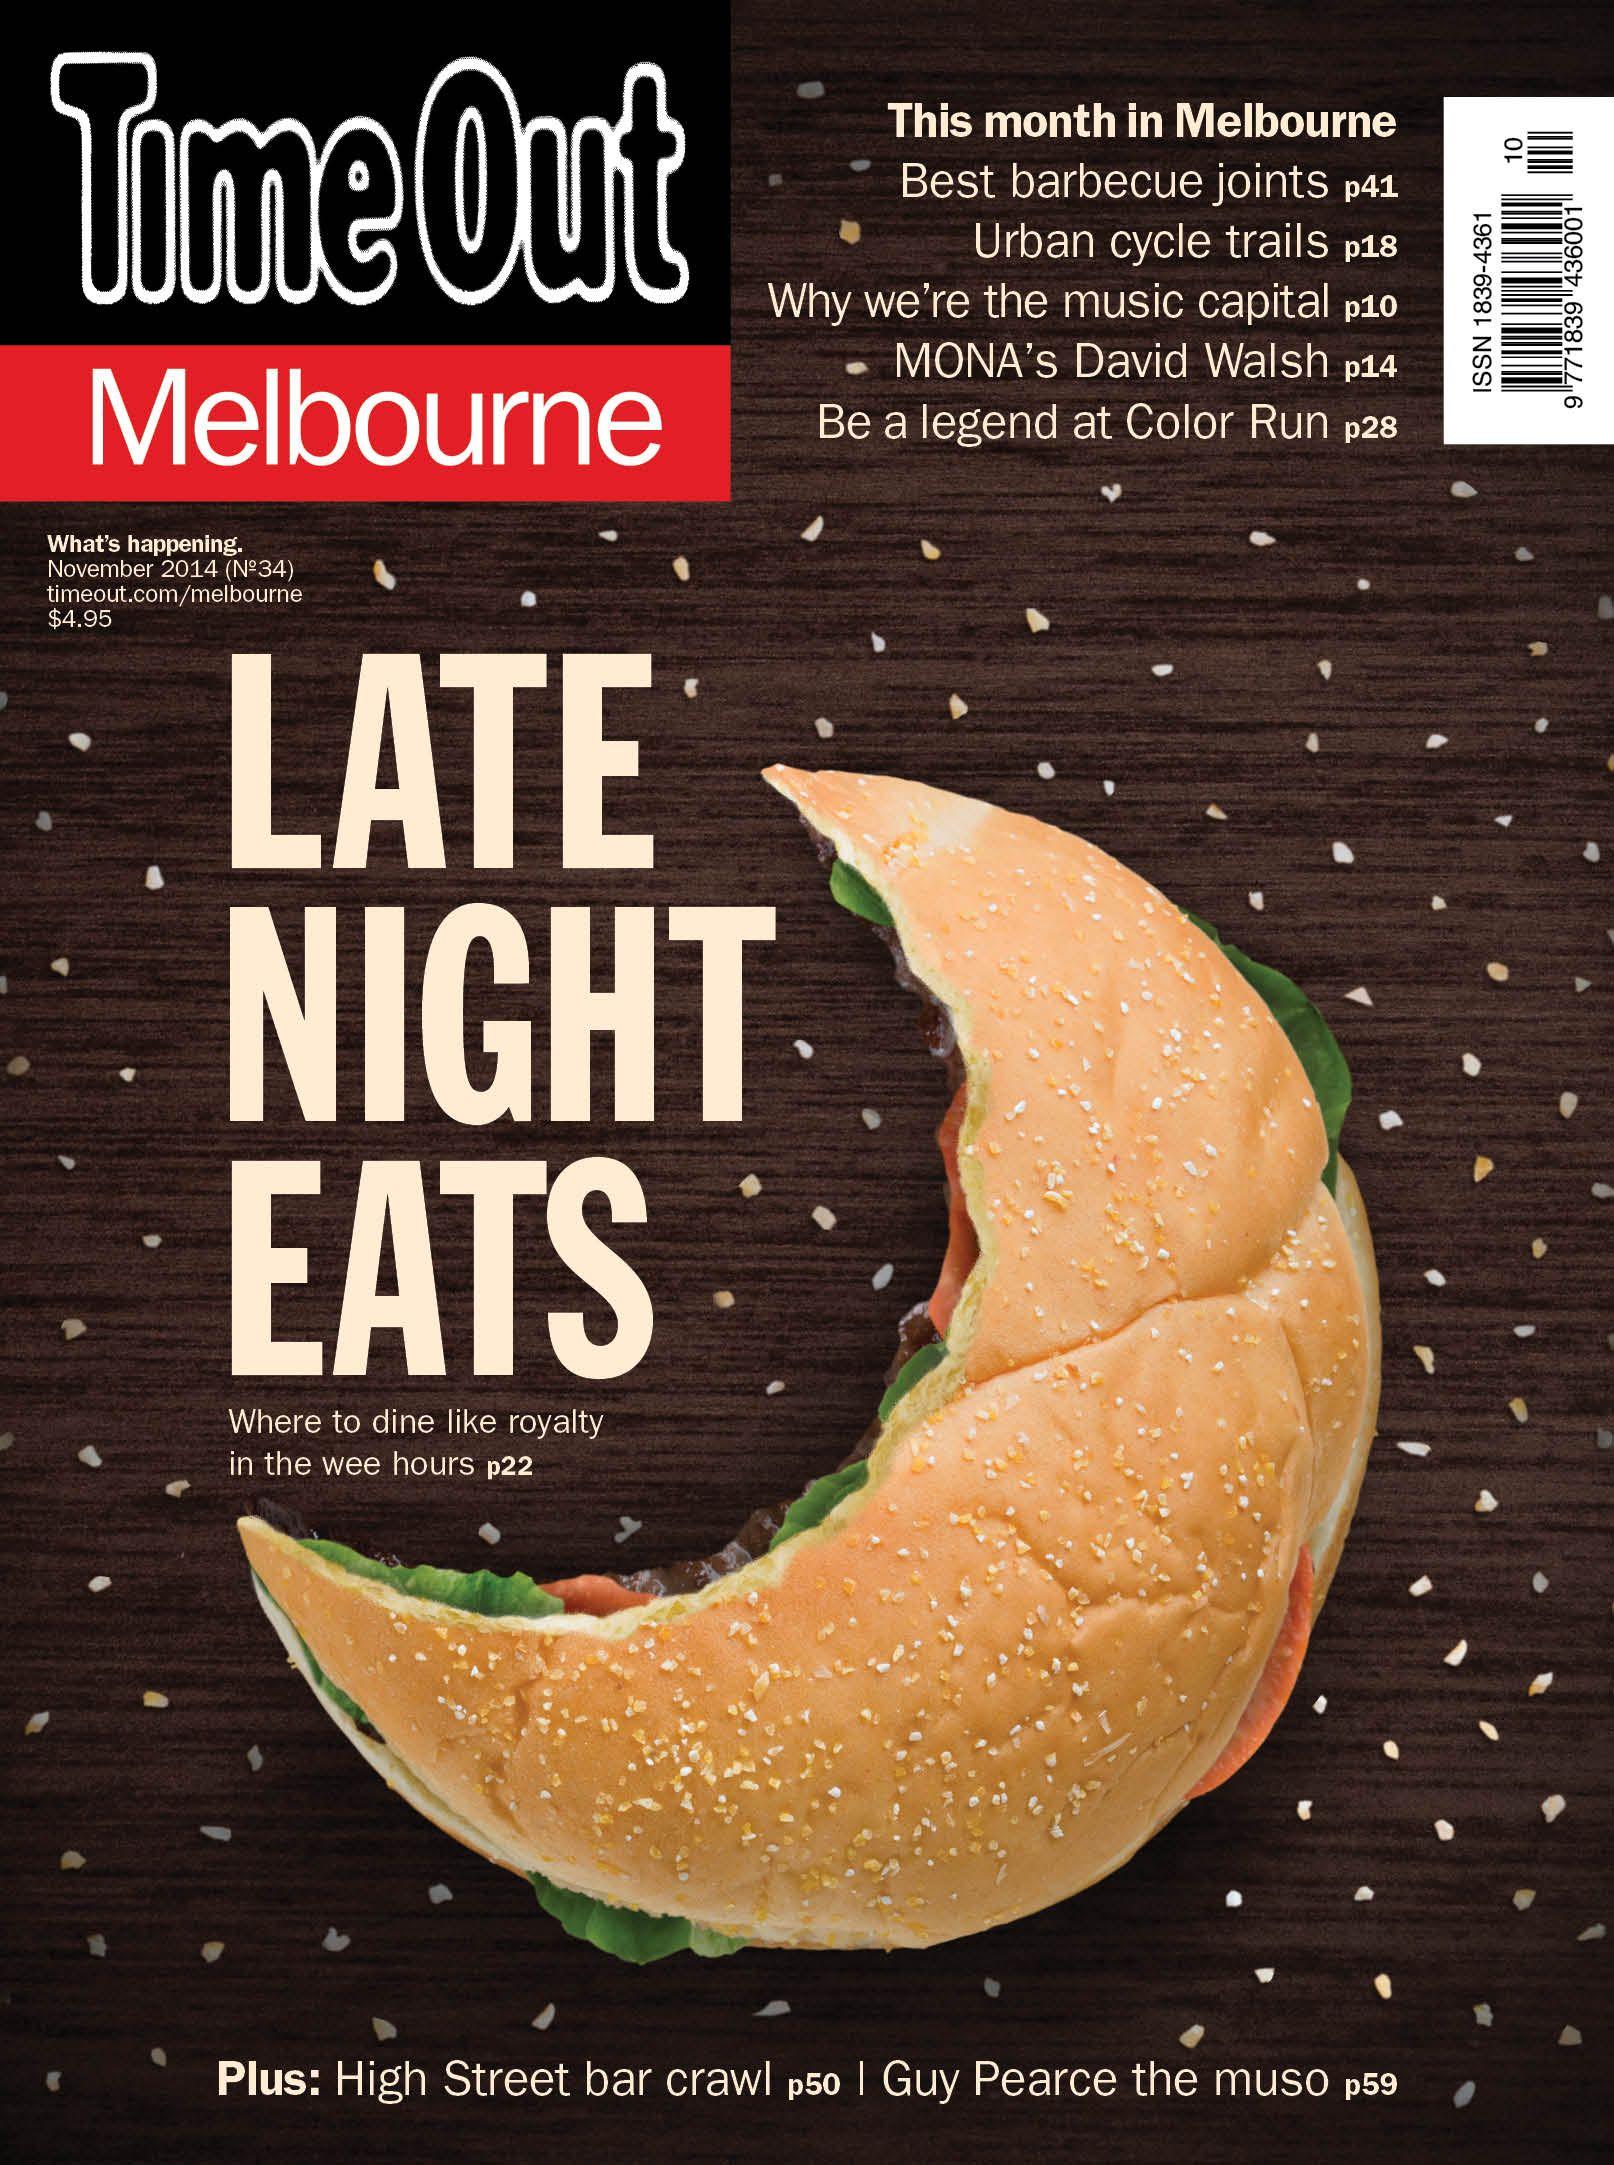 34 - Late night eats